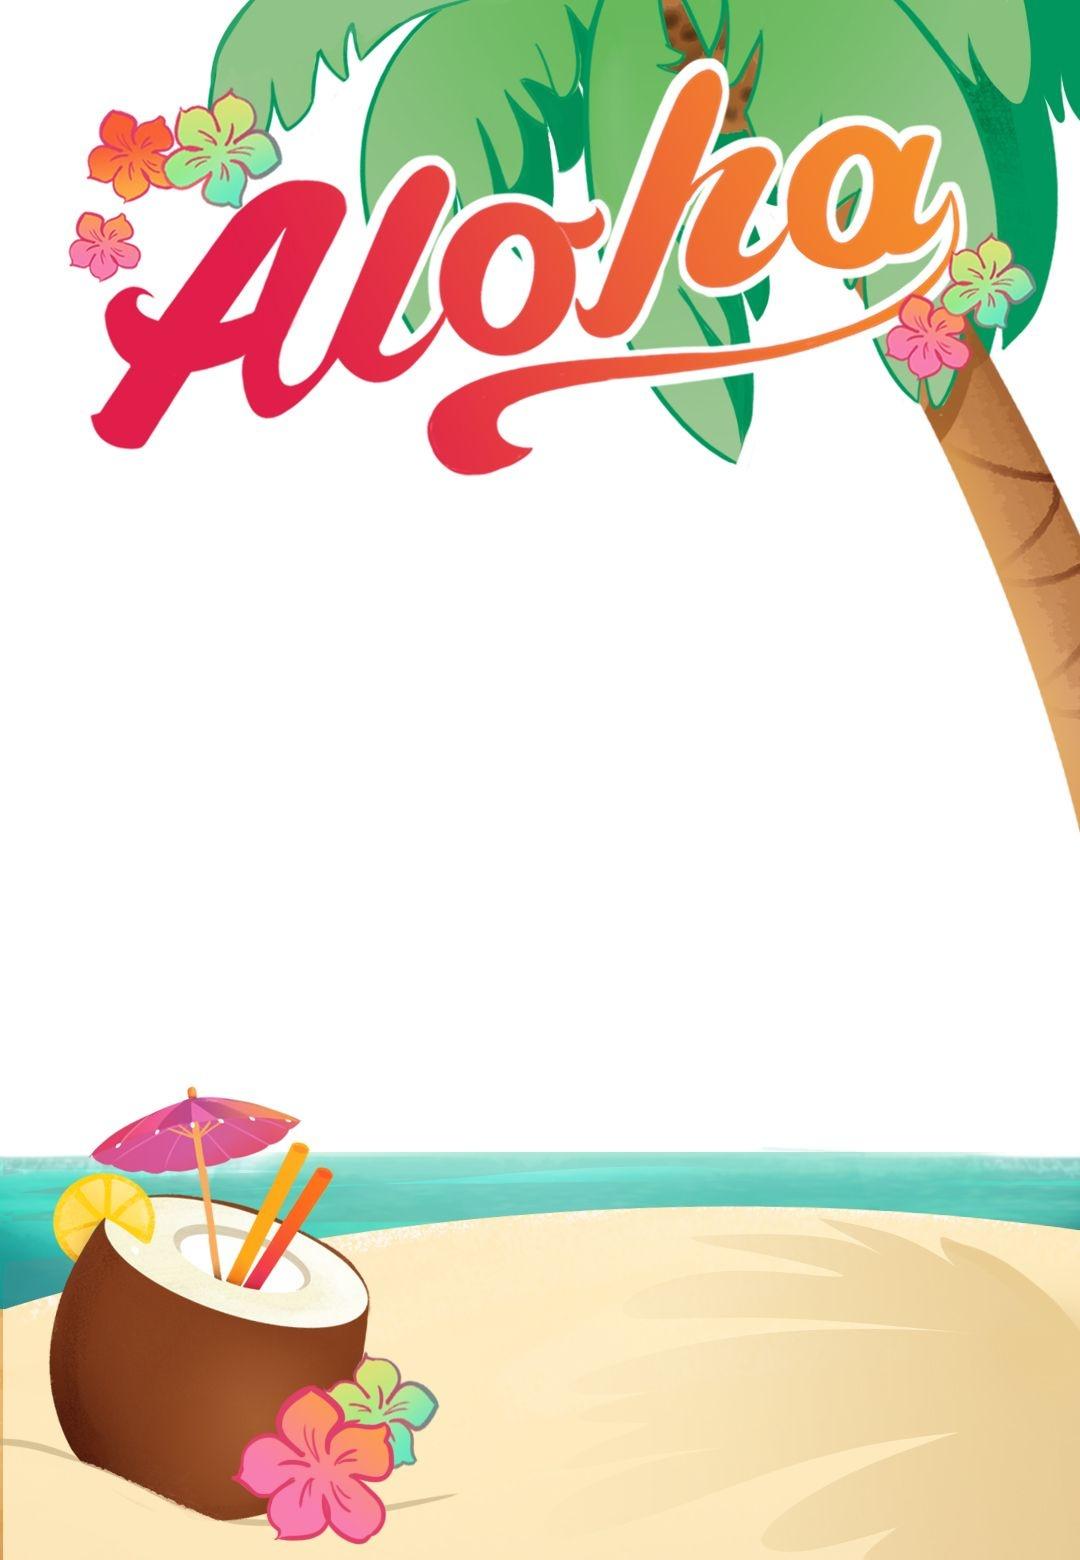 Luau Party - Free Printable Summer Party Invitation Template - Free Printable Luau Flyers